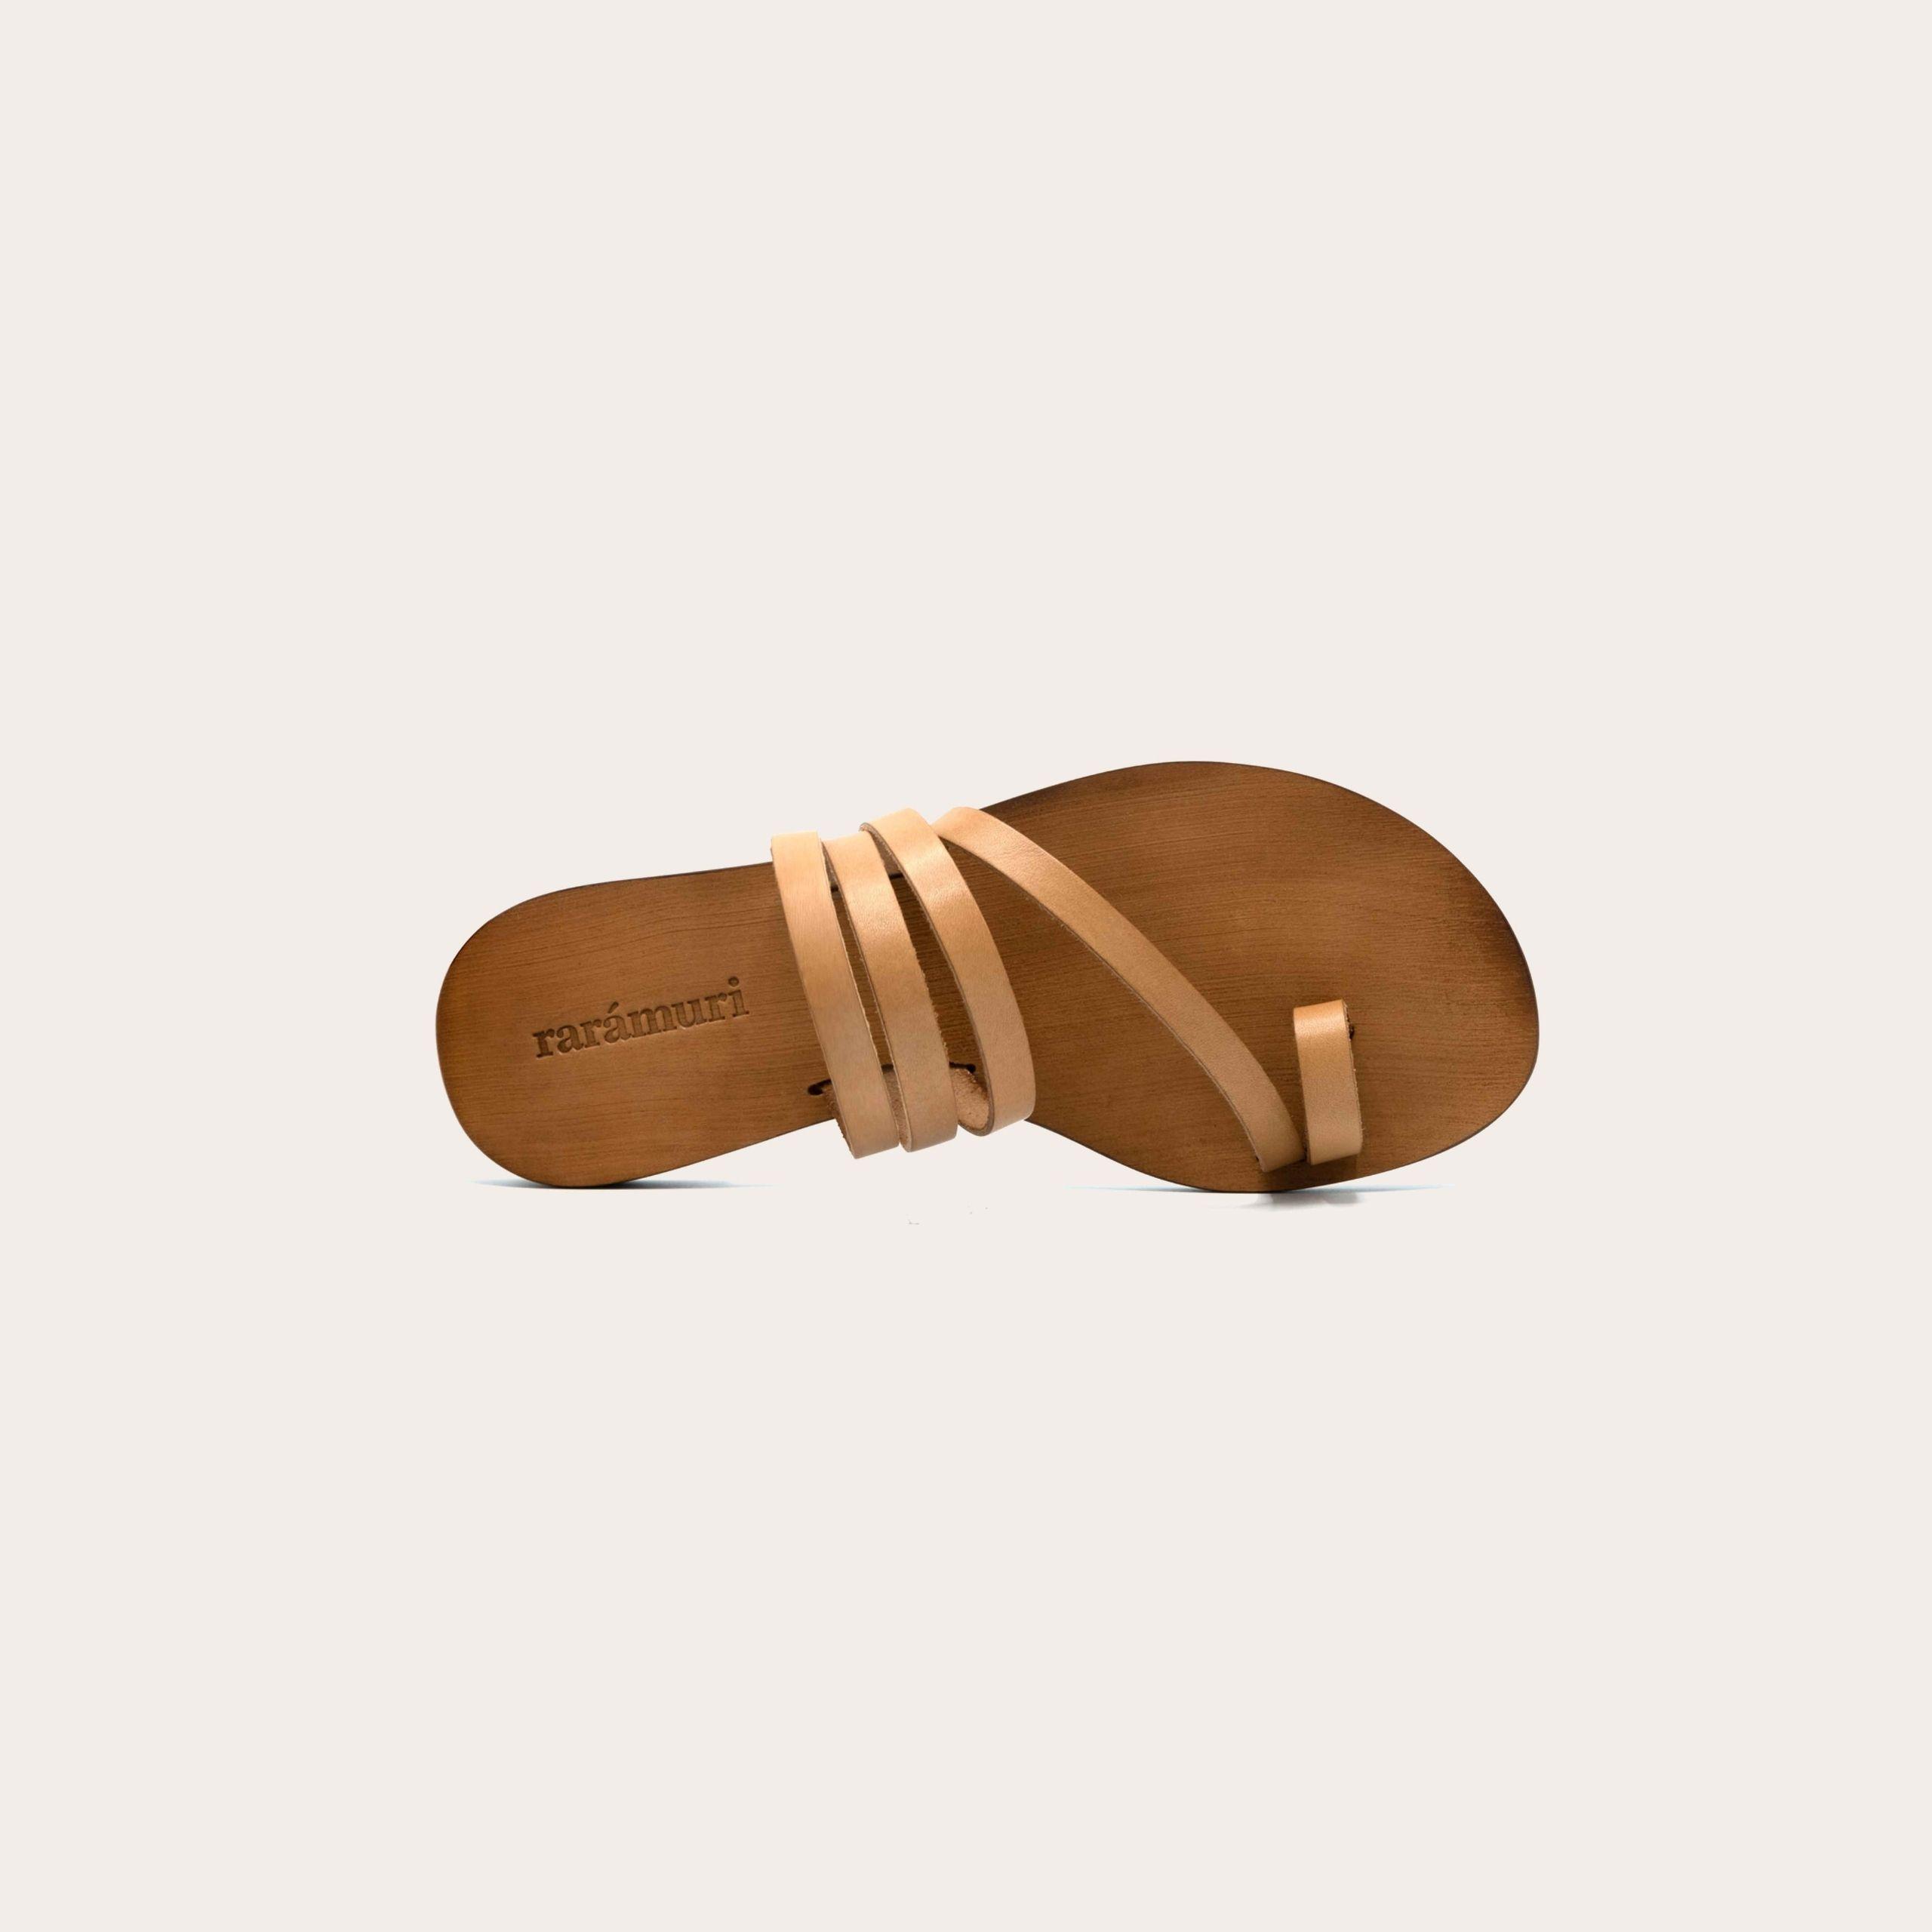 xico-beige_3_lintsandalen sandals travelsandals vegan sustainable sandals wikkelsandalen